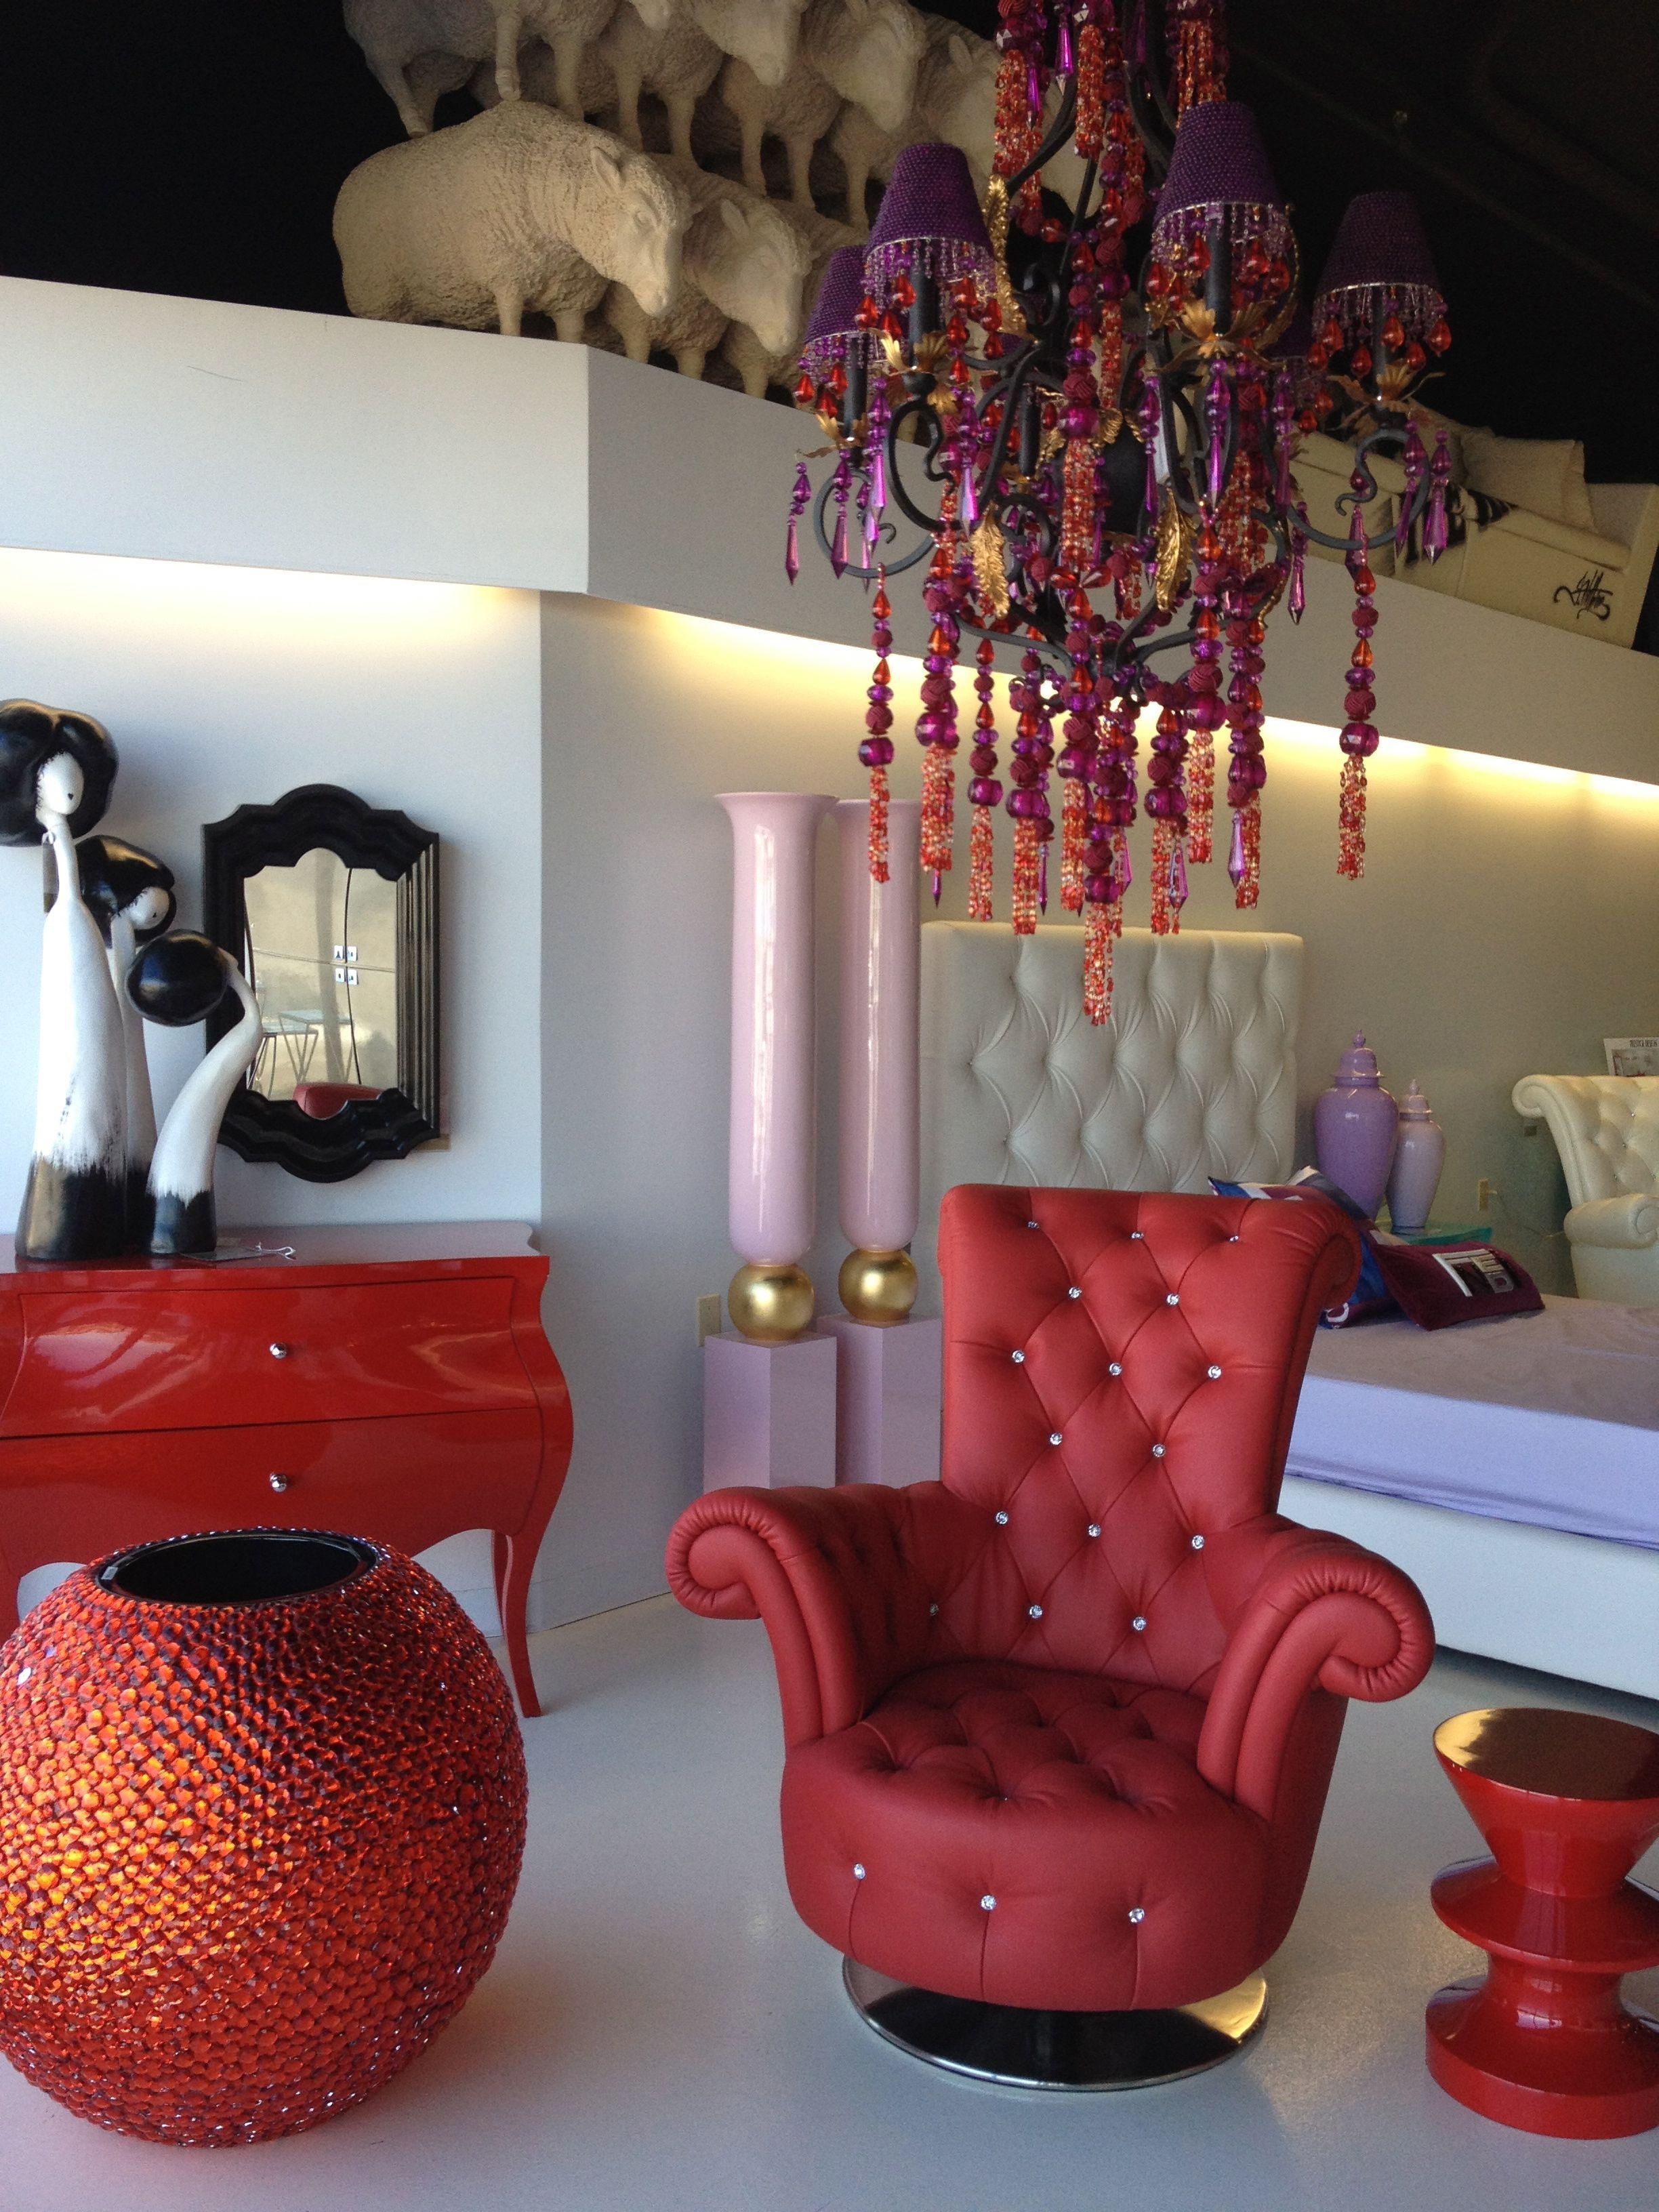 My Virgin Radio Post On An Amazing Furniture Store Find: Lida Loft!  Http://montreal.virginradio.ca/blog/Style/blogentry.aspx?BlogEntryIDu003d10369208